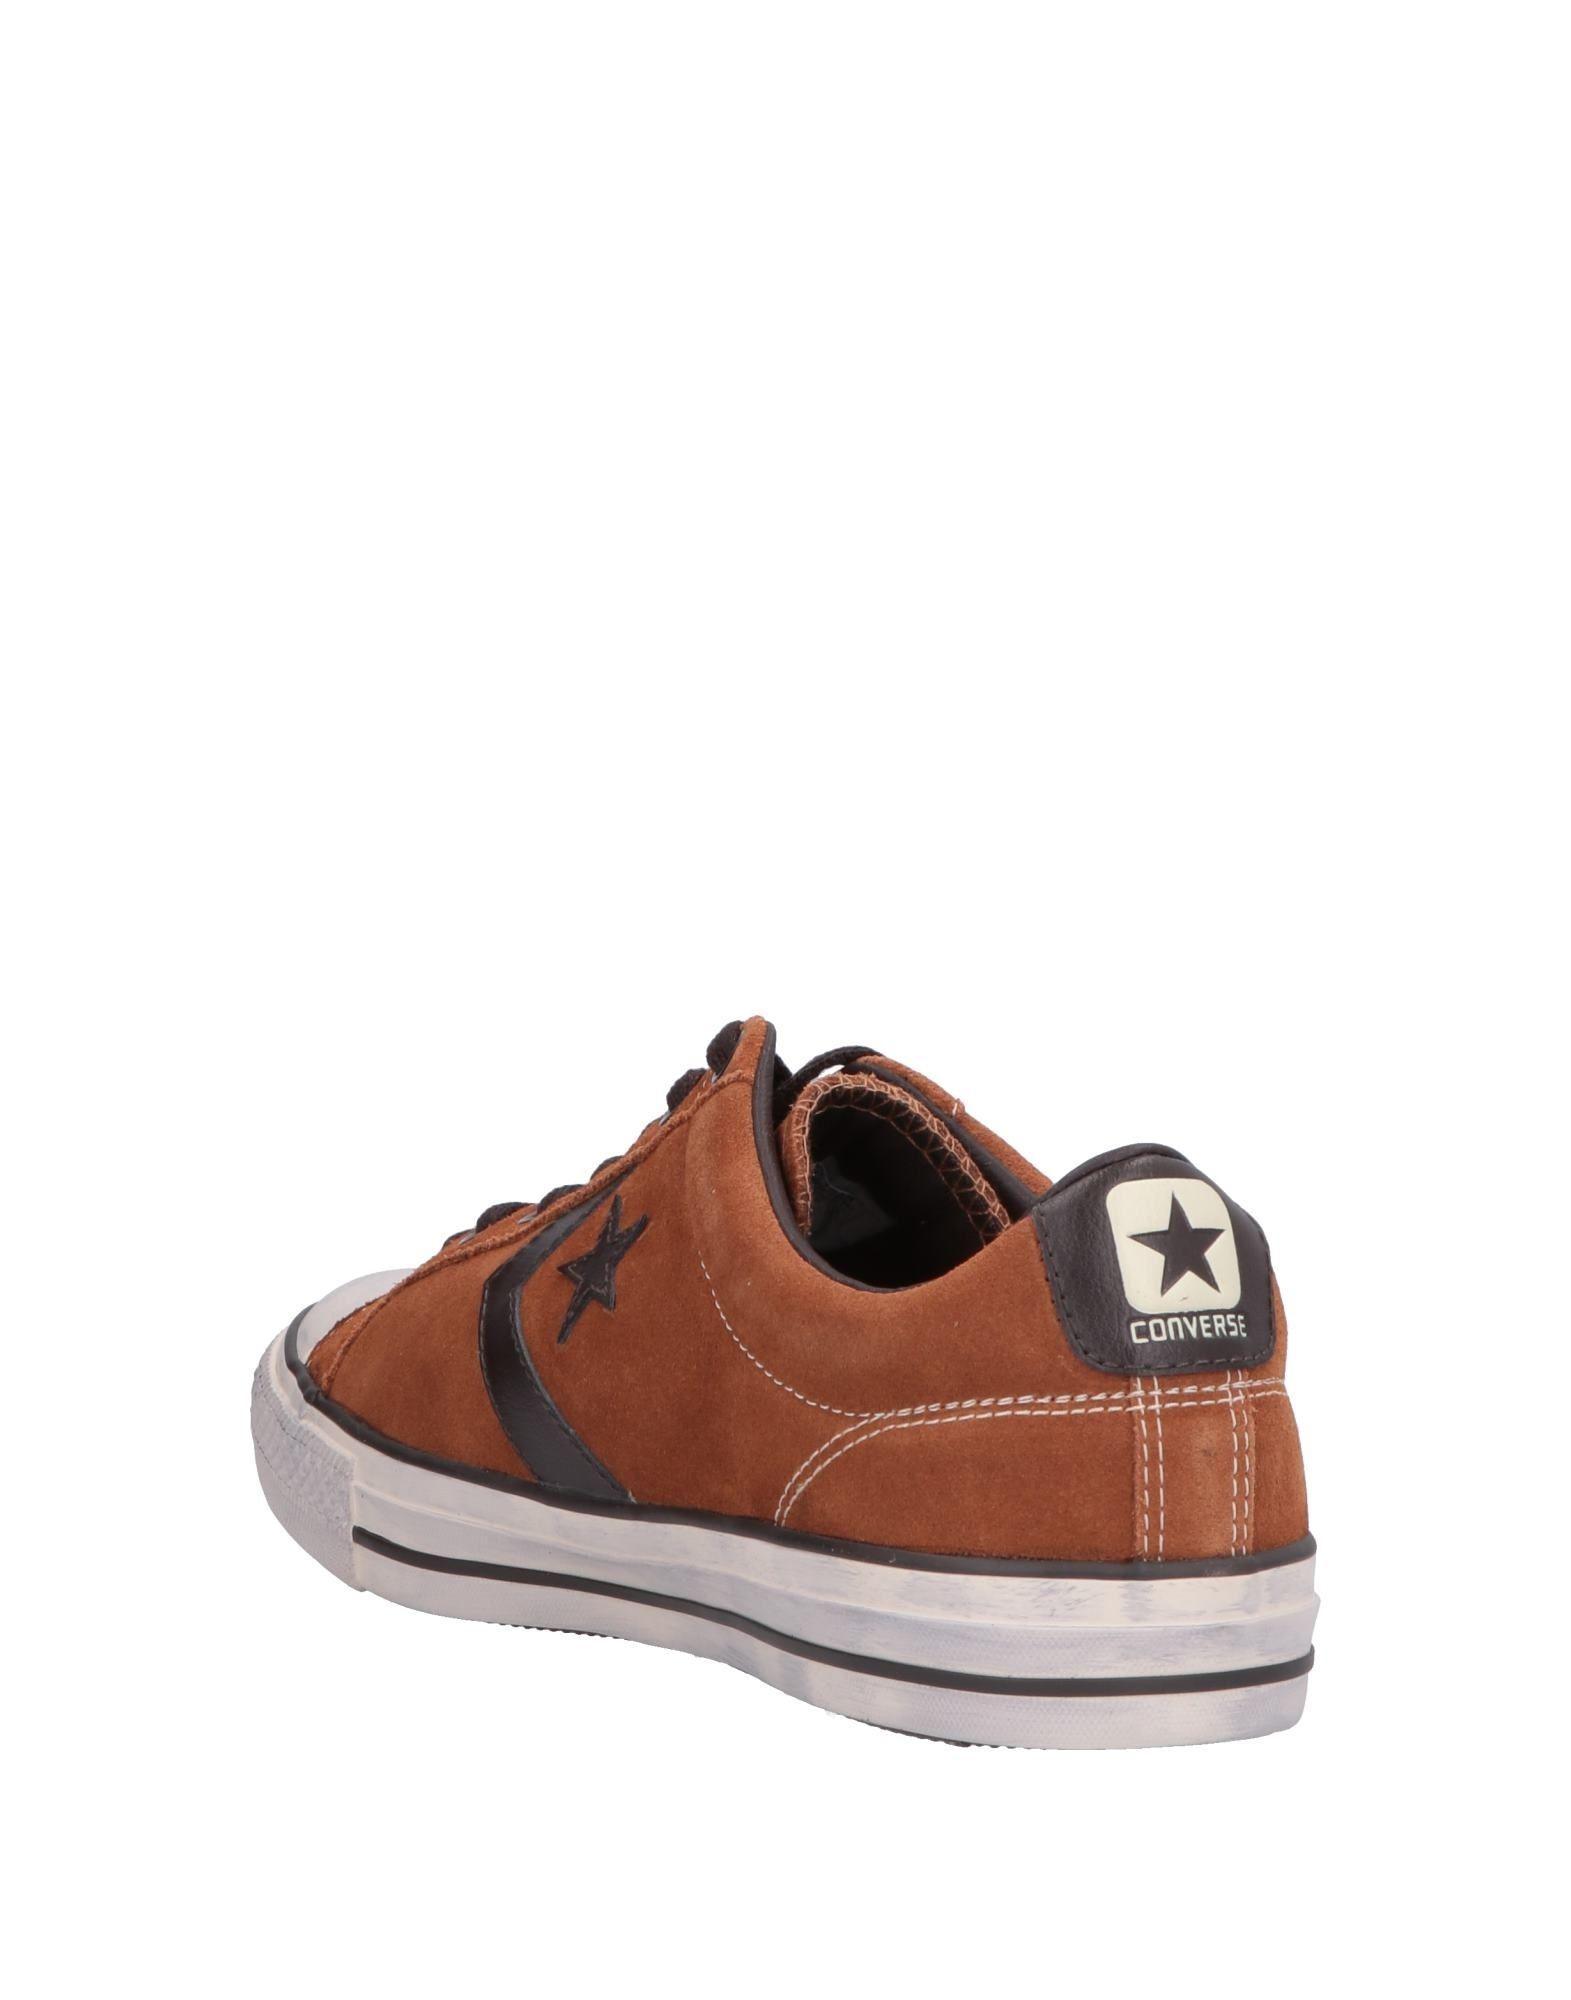 eaeb1b62b5bebe Converse Low-tops   Sneakers in Brown for Men - Lyst